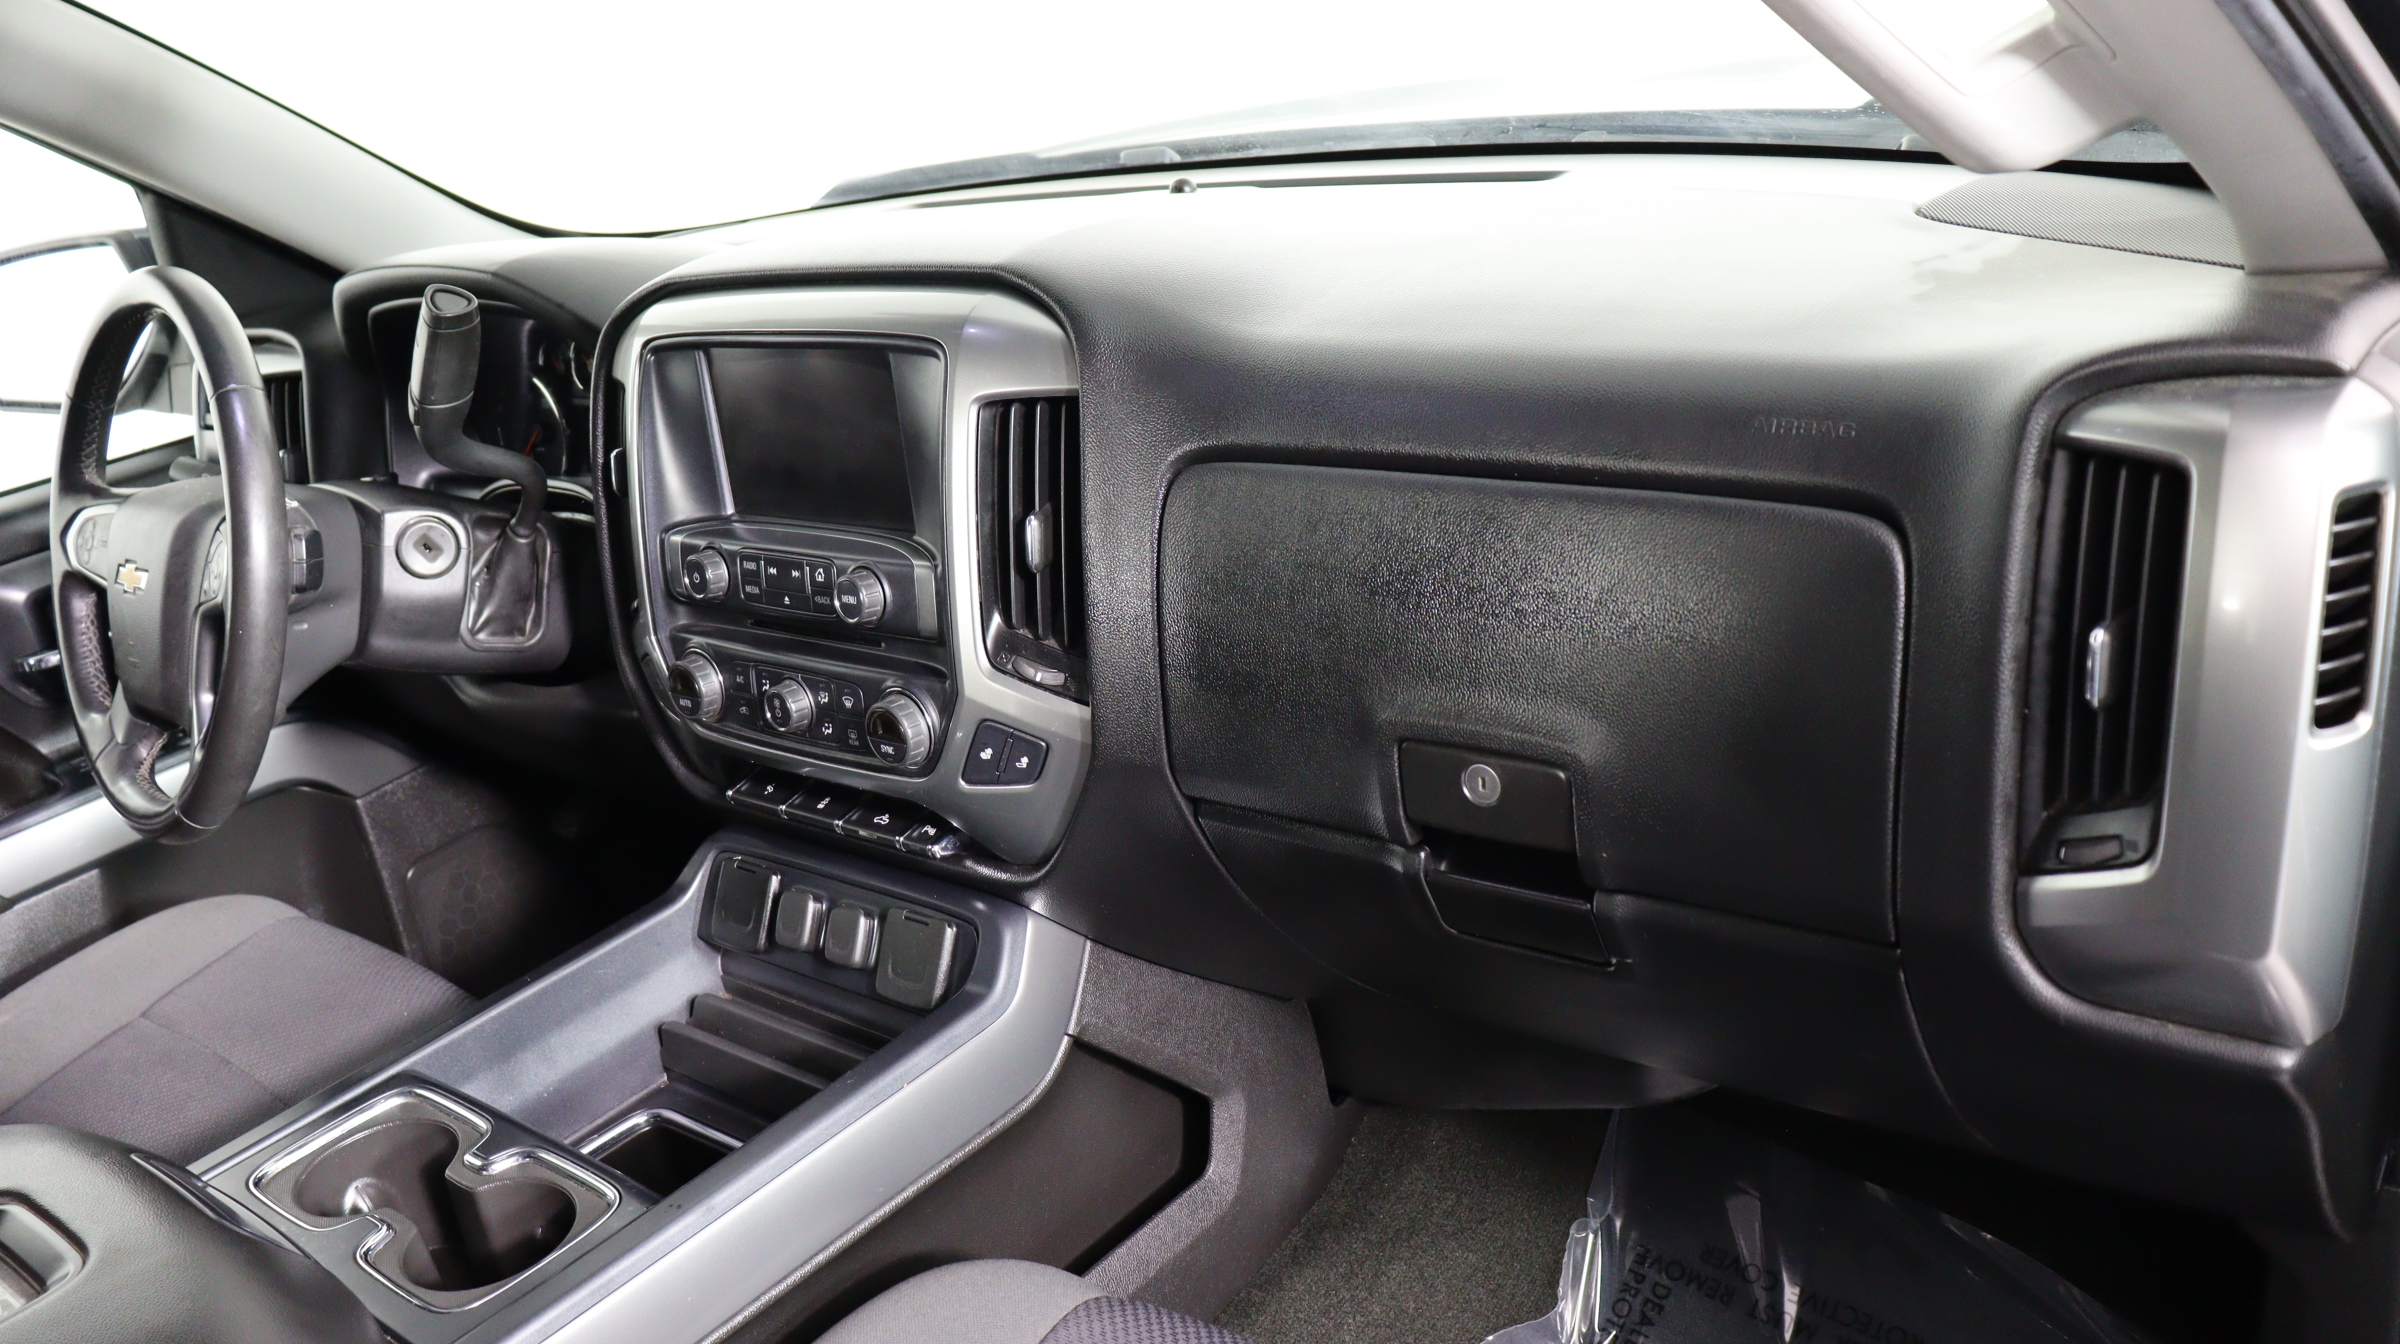 Carvix - Used vehicle - Truck CHEVROLET SILVERADO 1500 2017